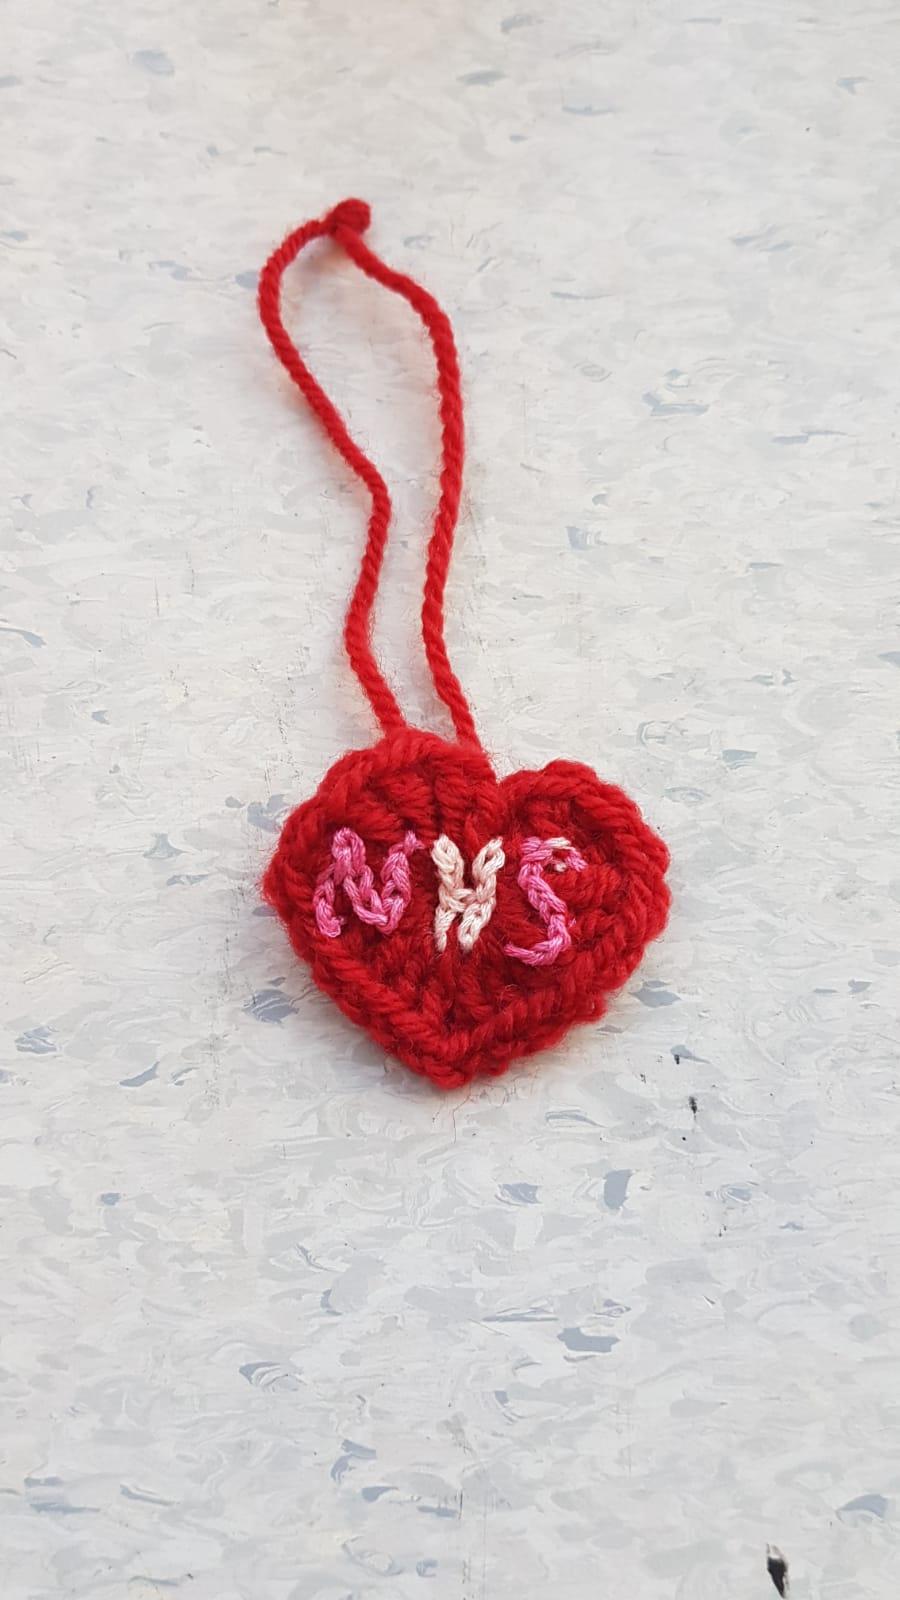 heart nhs